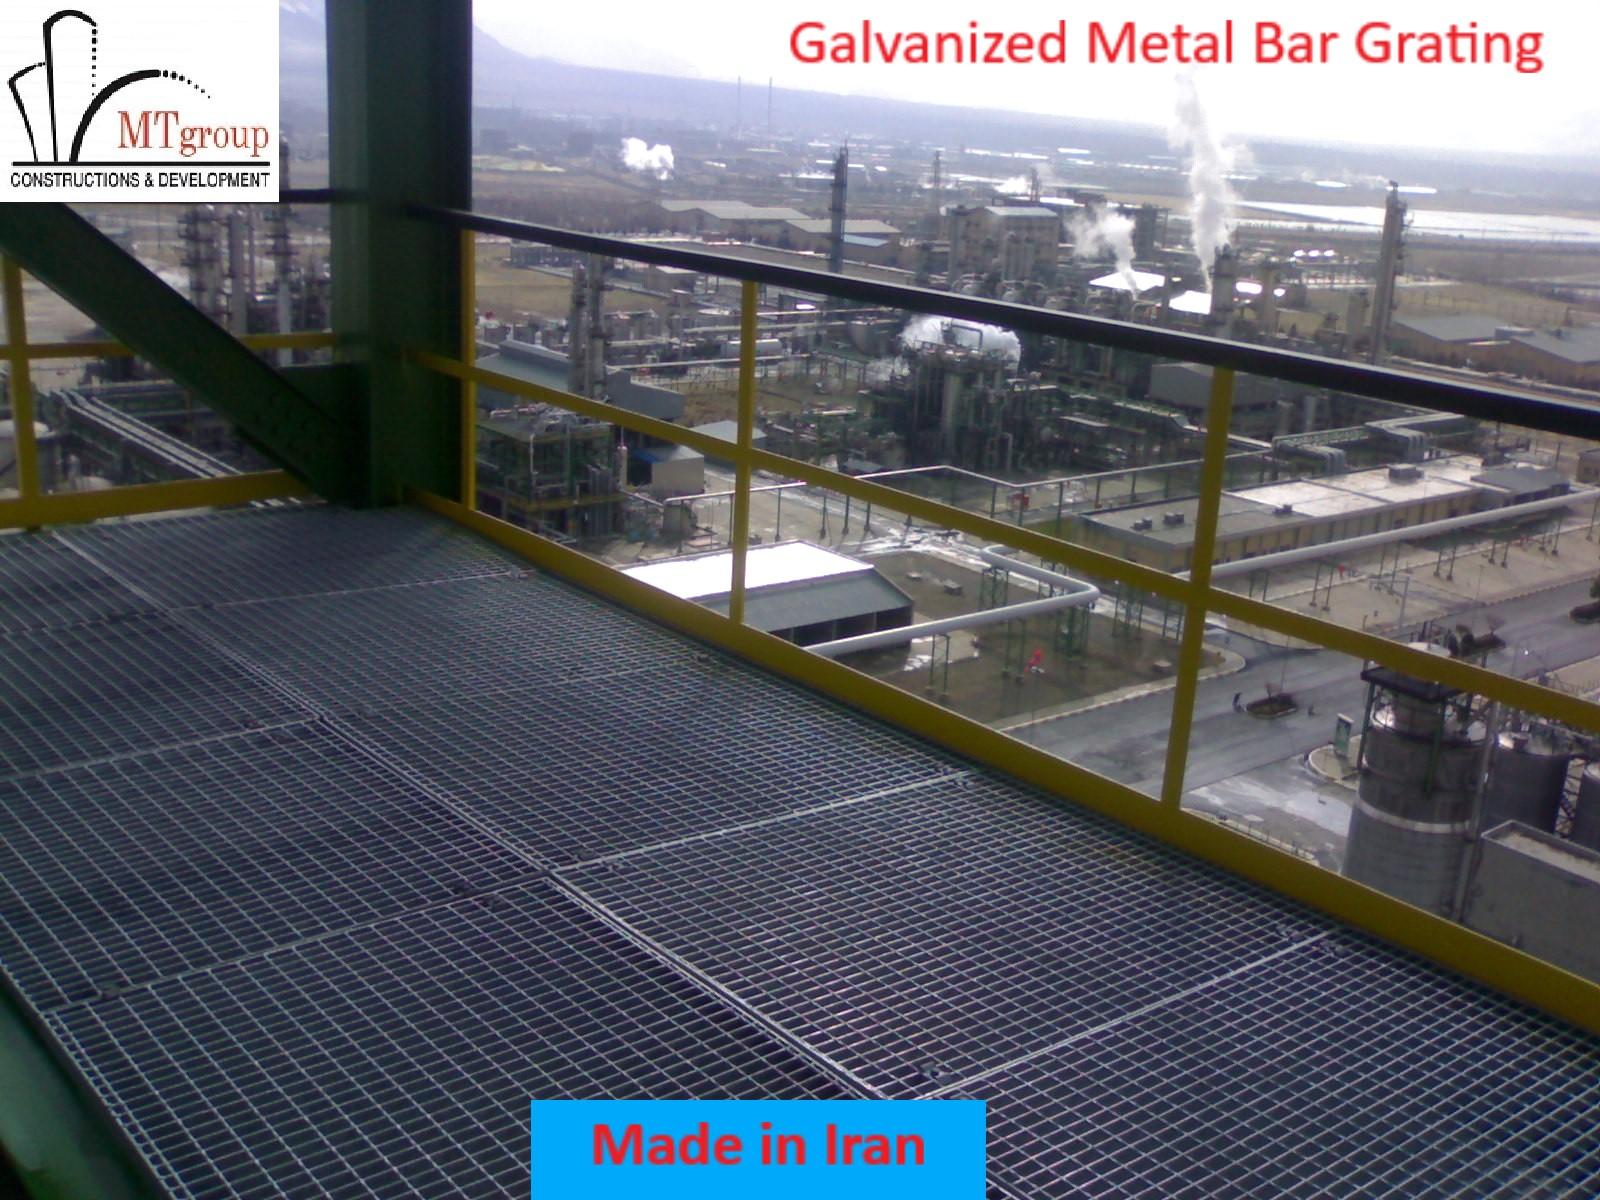 Galvanized Metal bar grating